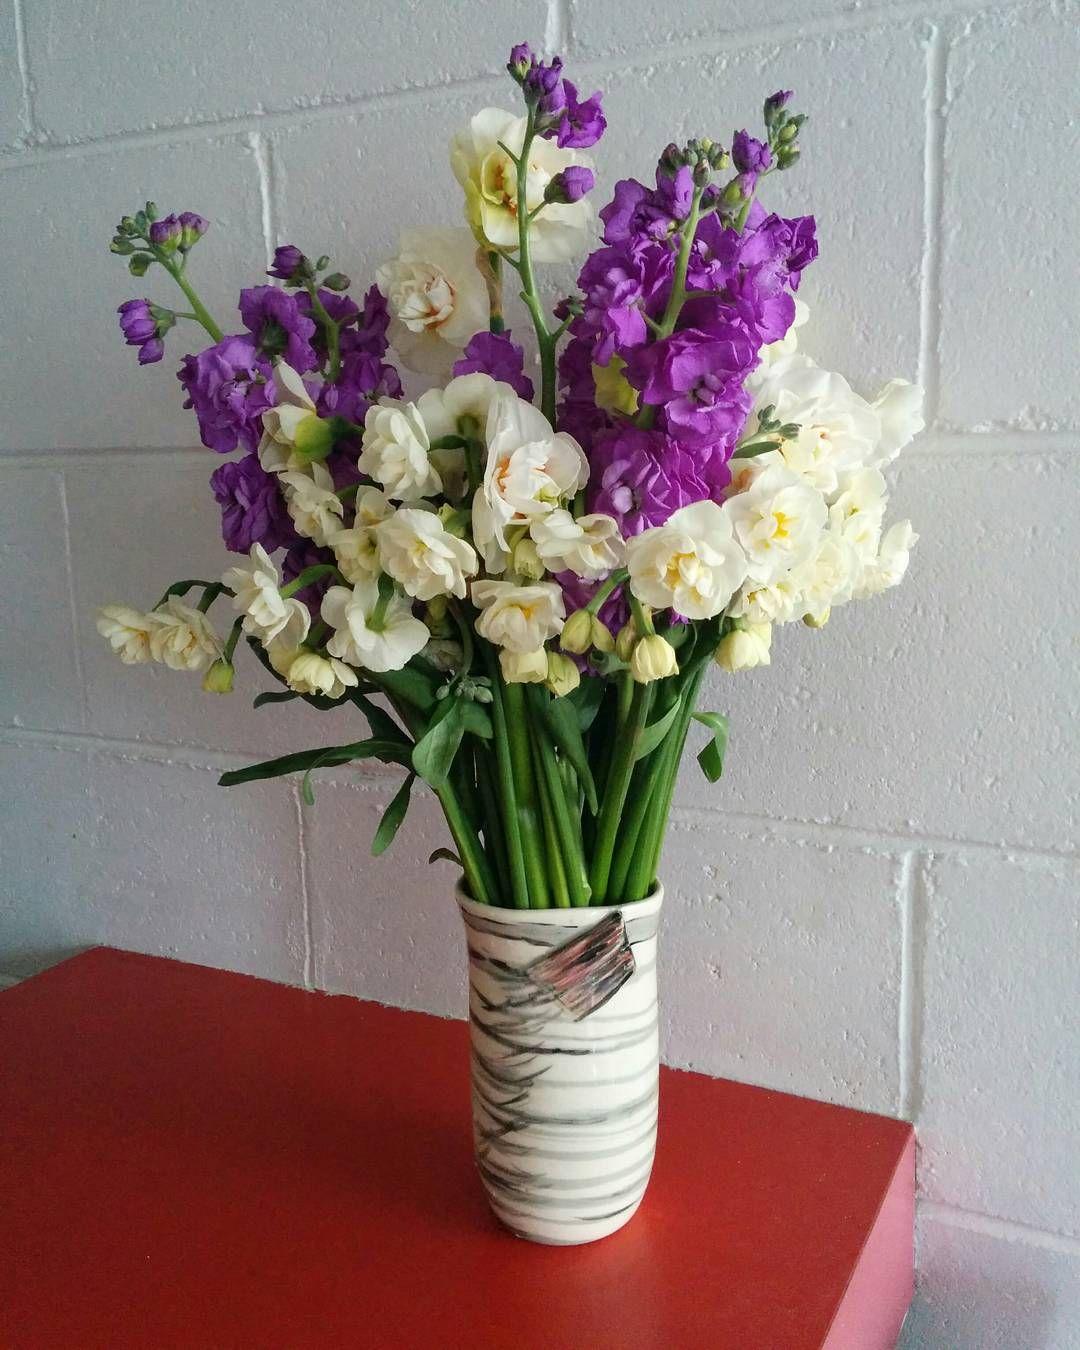 My lovely flower in my vase best birthday gift in the world my lovely flower in my vase best birthday gift in izmirmasajfo